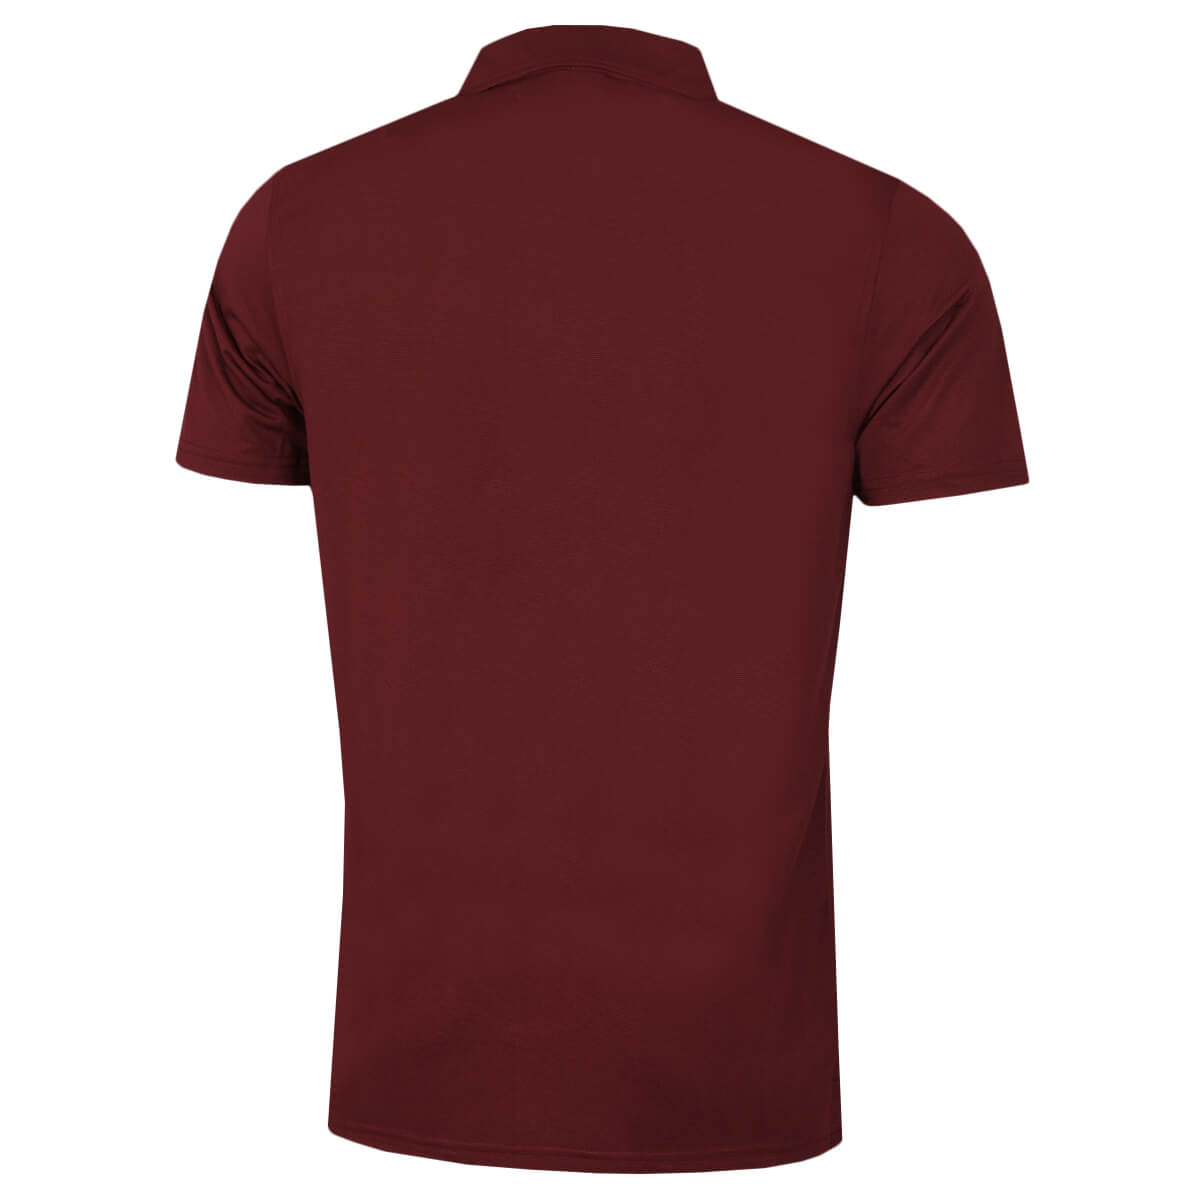 thumbnail 6 - Calvin Klein Mens 2021 Central Eco Light Wicking Golf Polo Shirt 28% OFF RRP